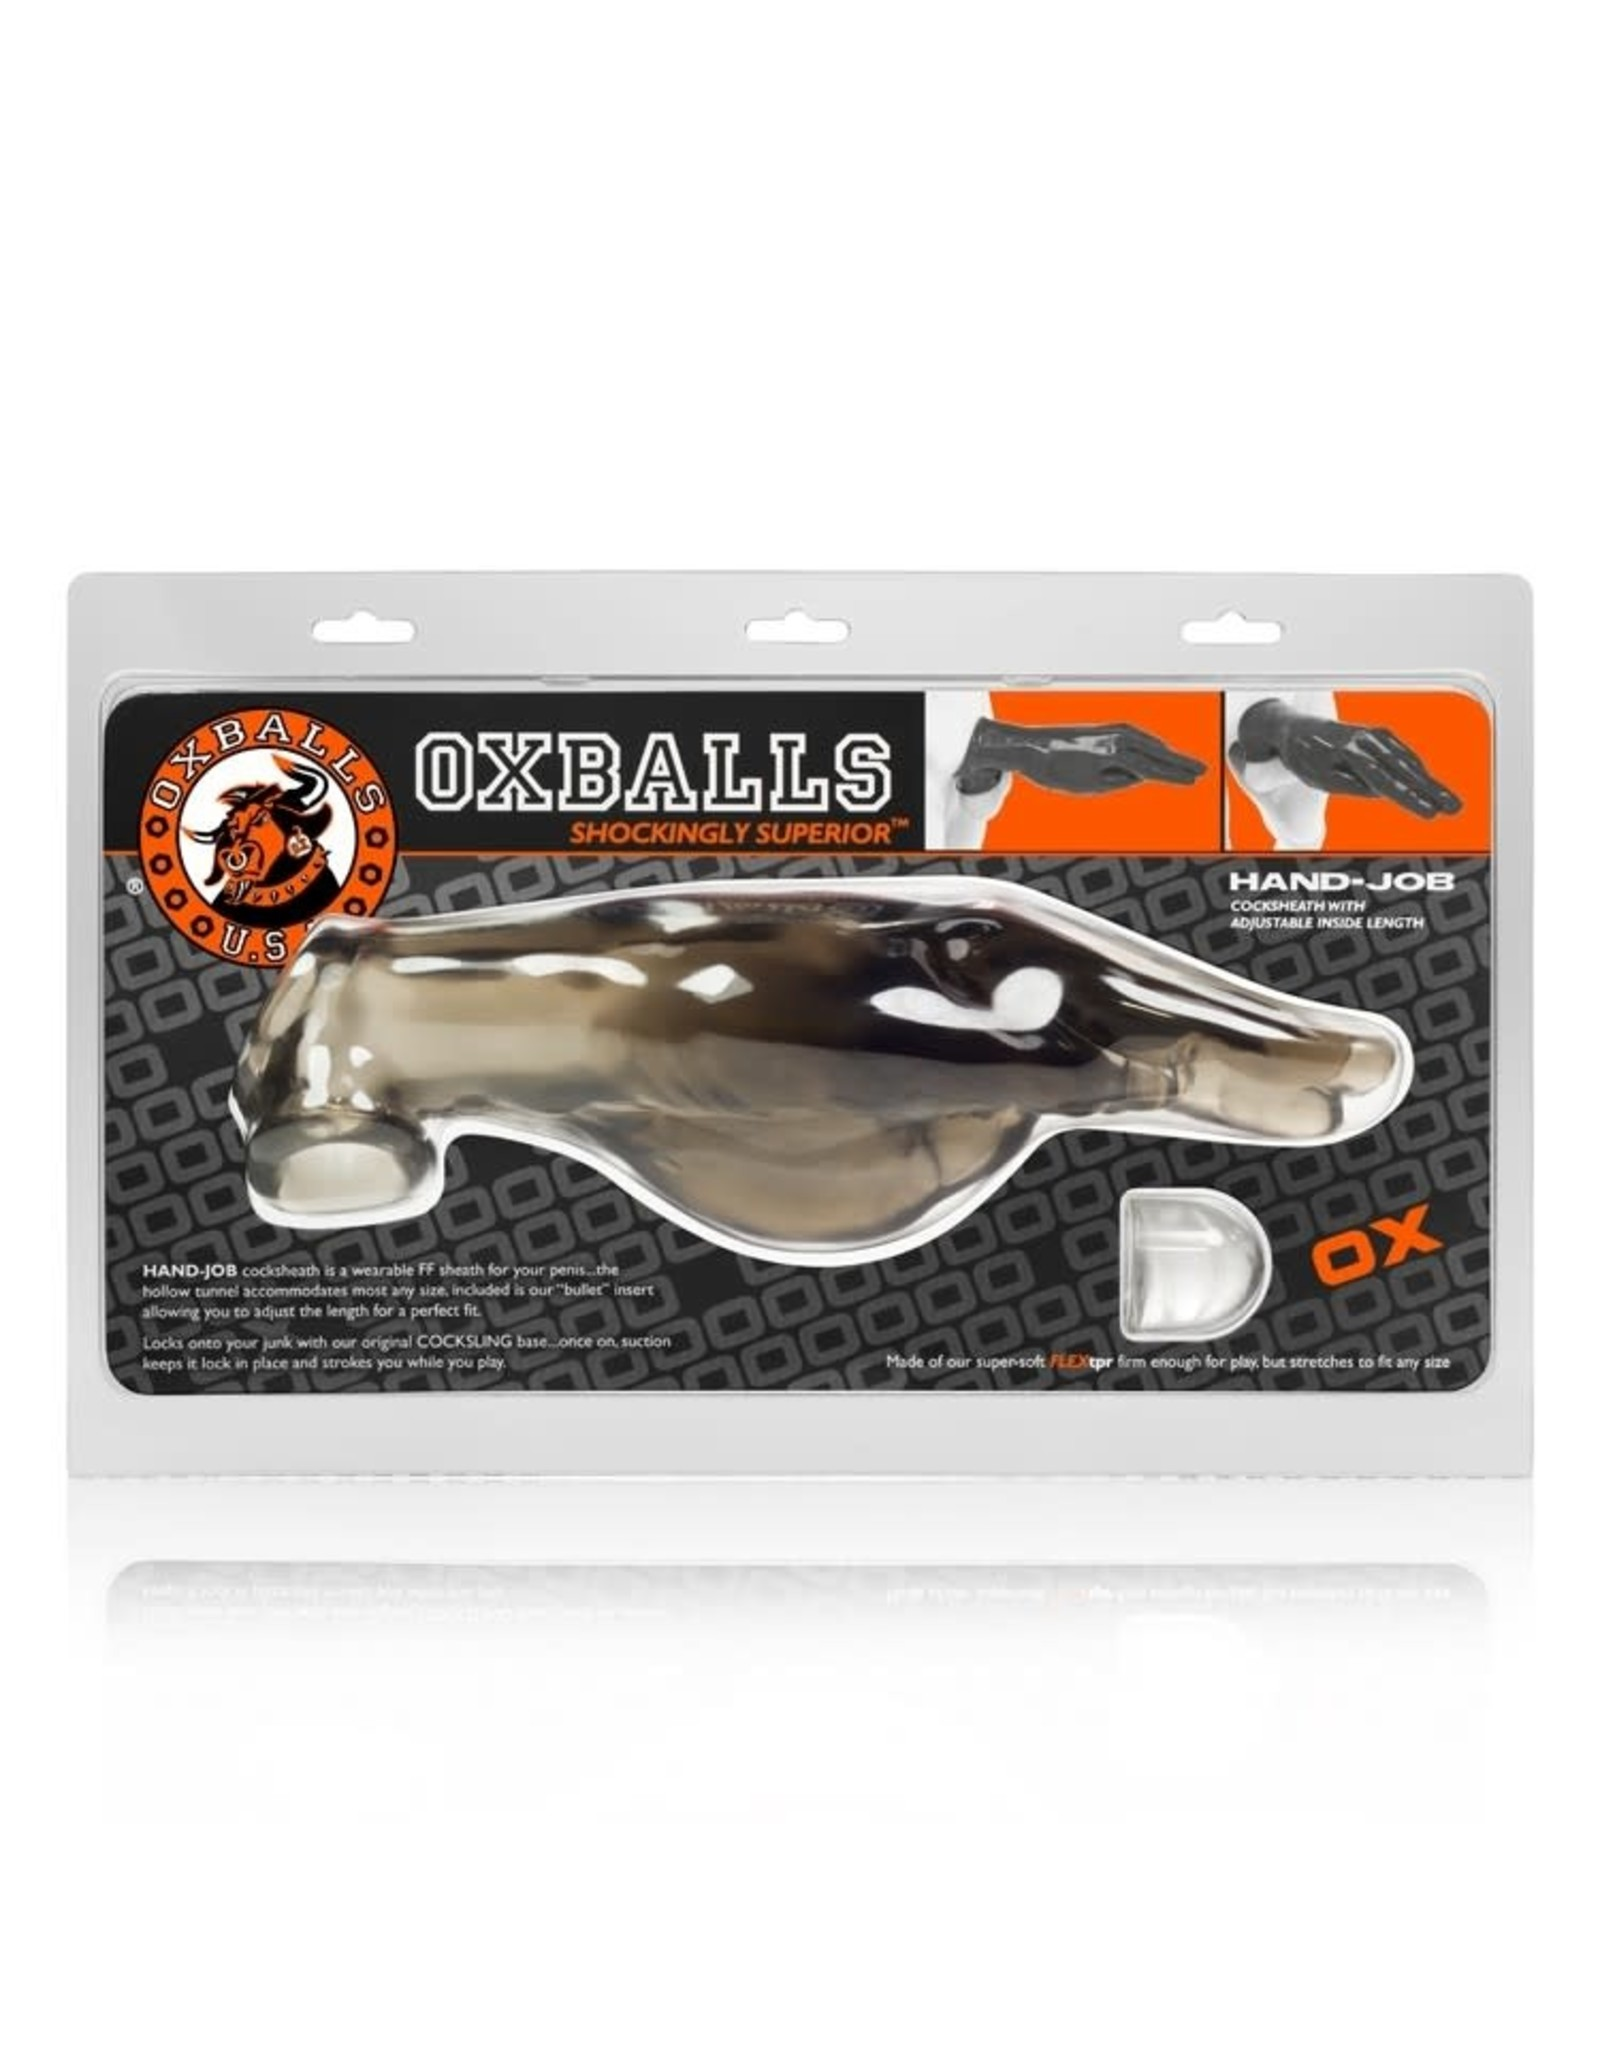 Oxballs OxBalls Hand-Job Cocksheath